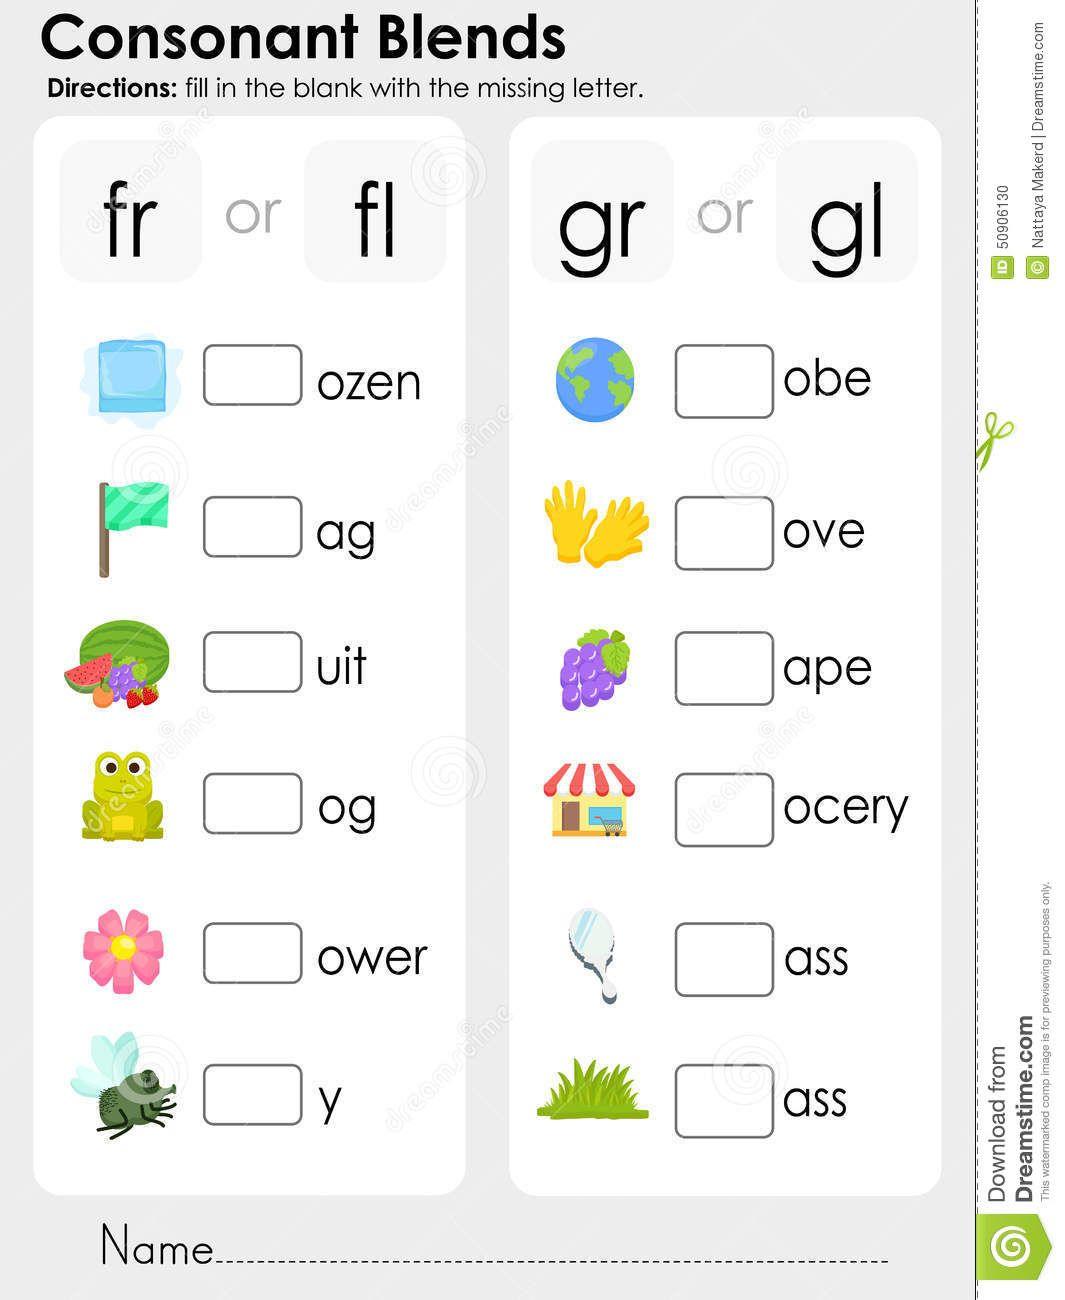 medium resolution of Consonant Blends Worksheets Pdf - Letter